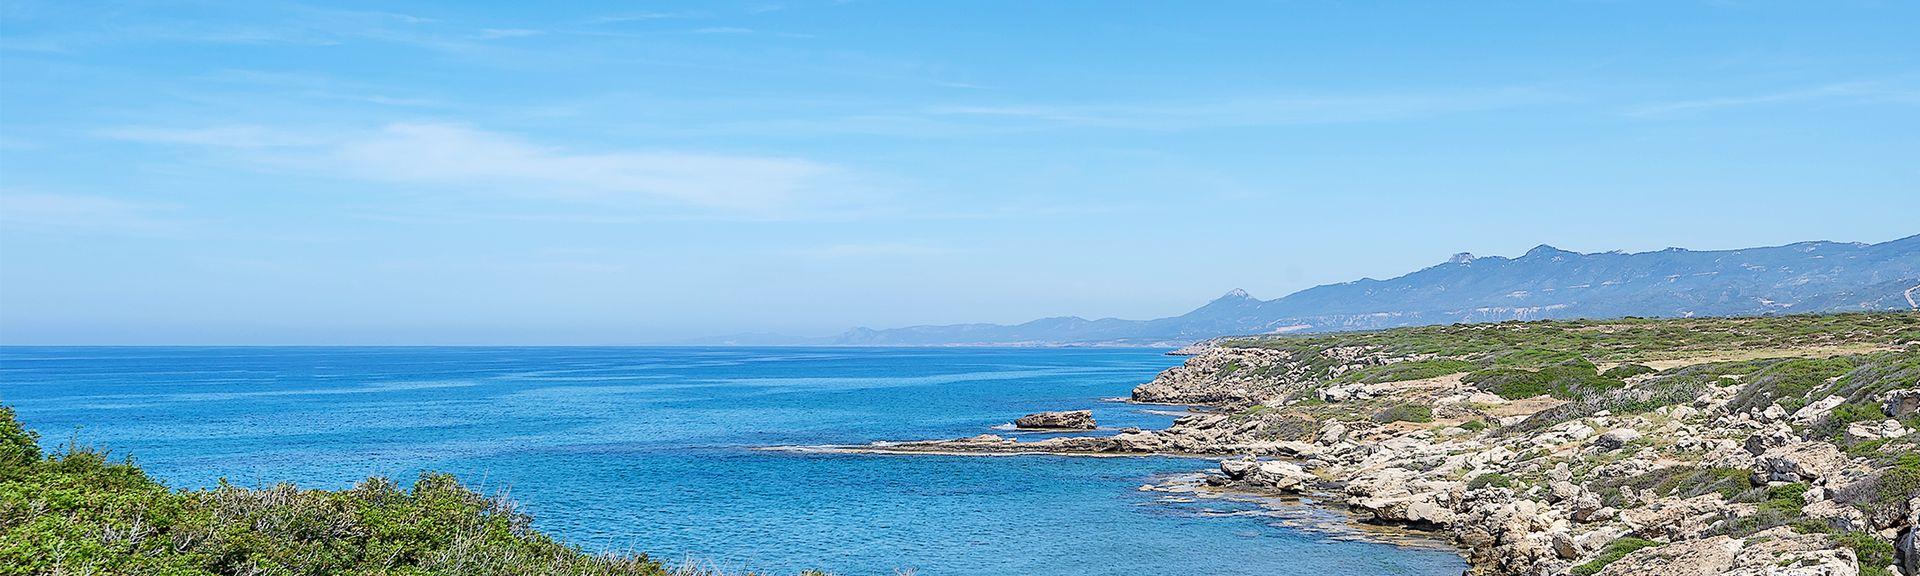 Karpas Peninsula, Chipre